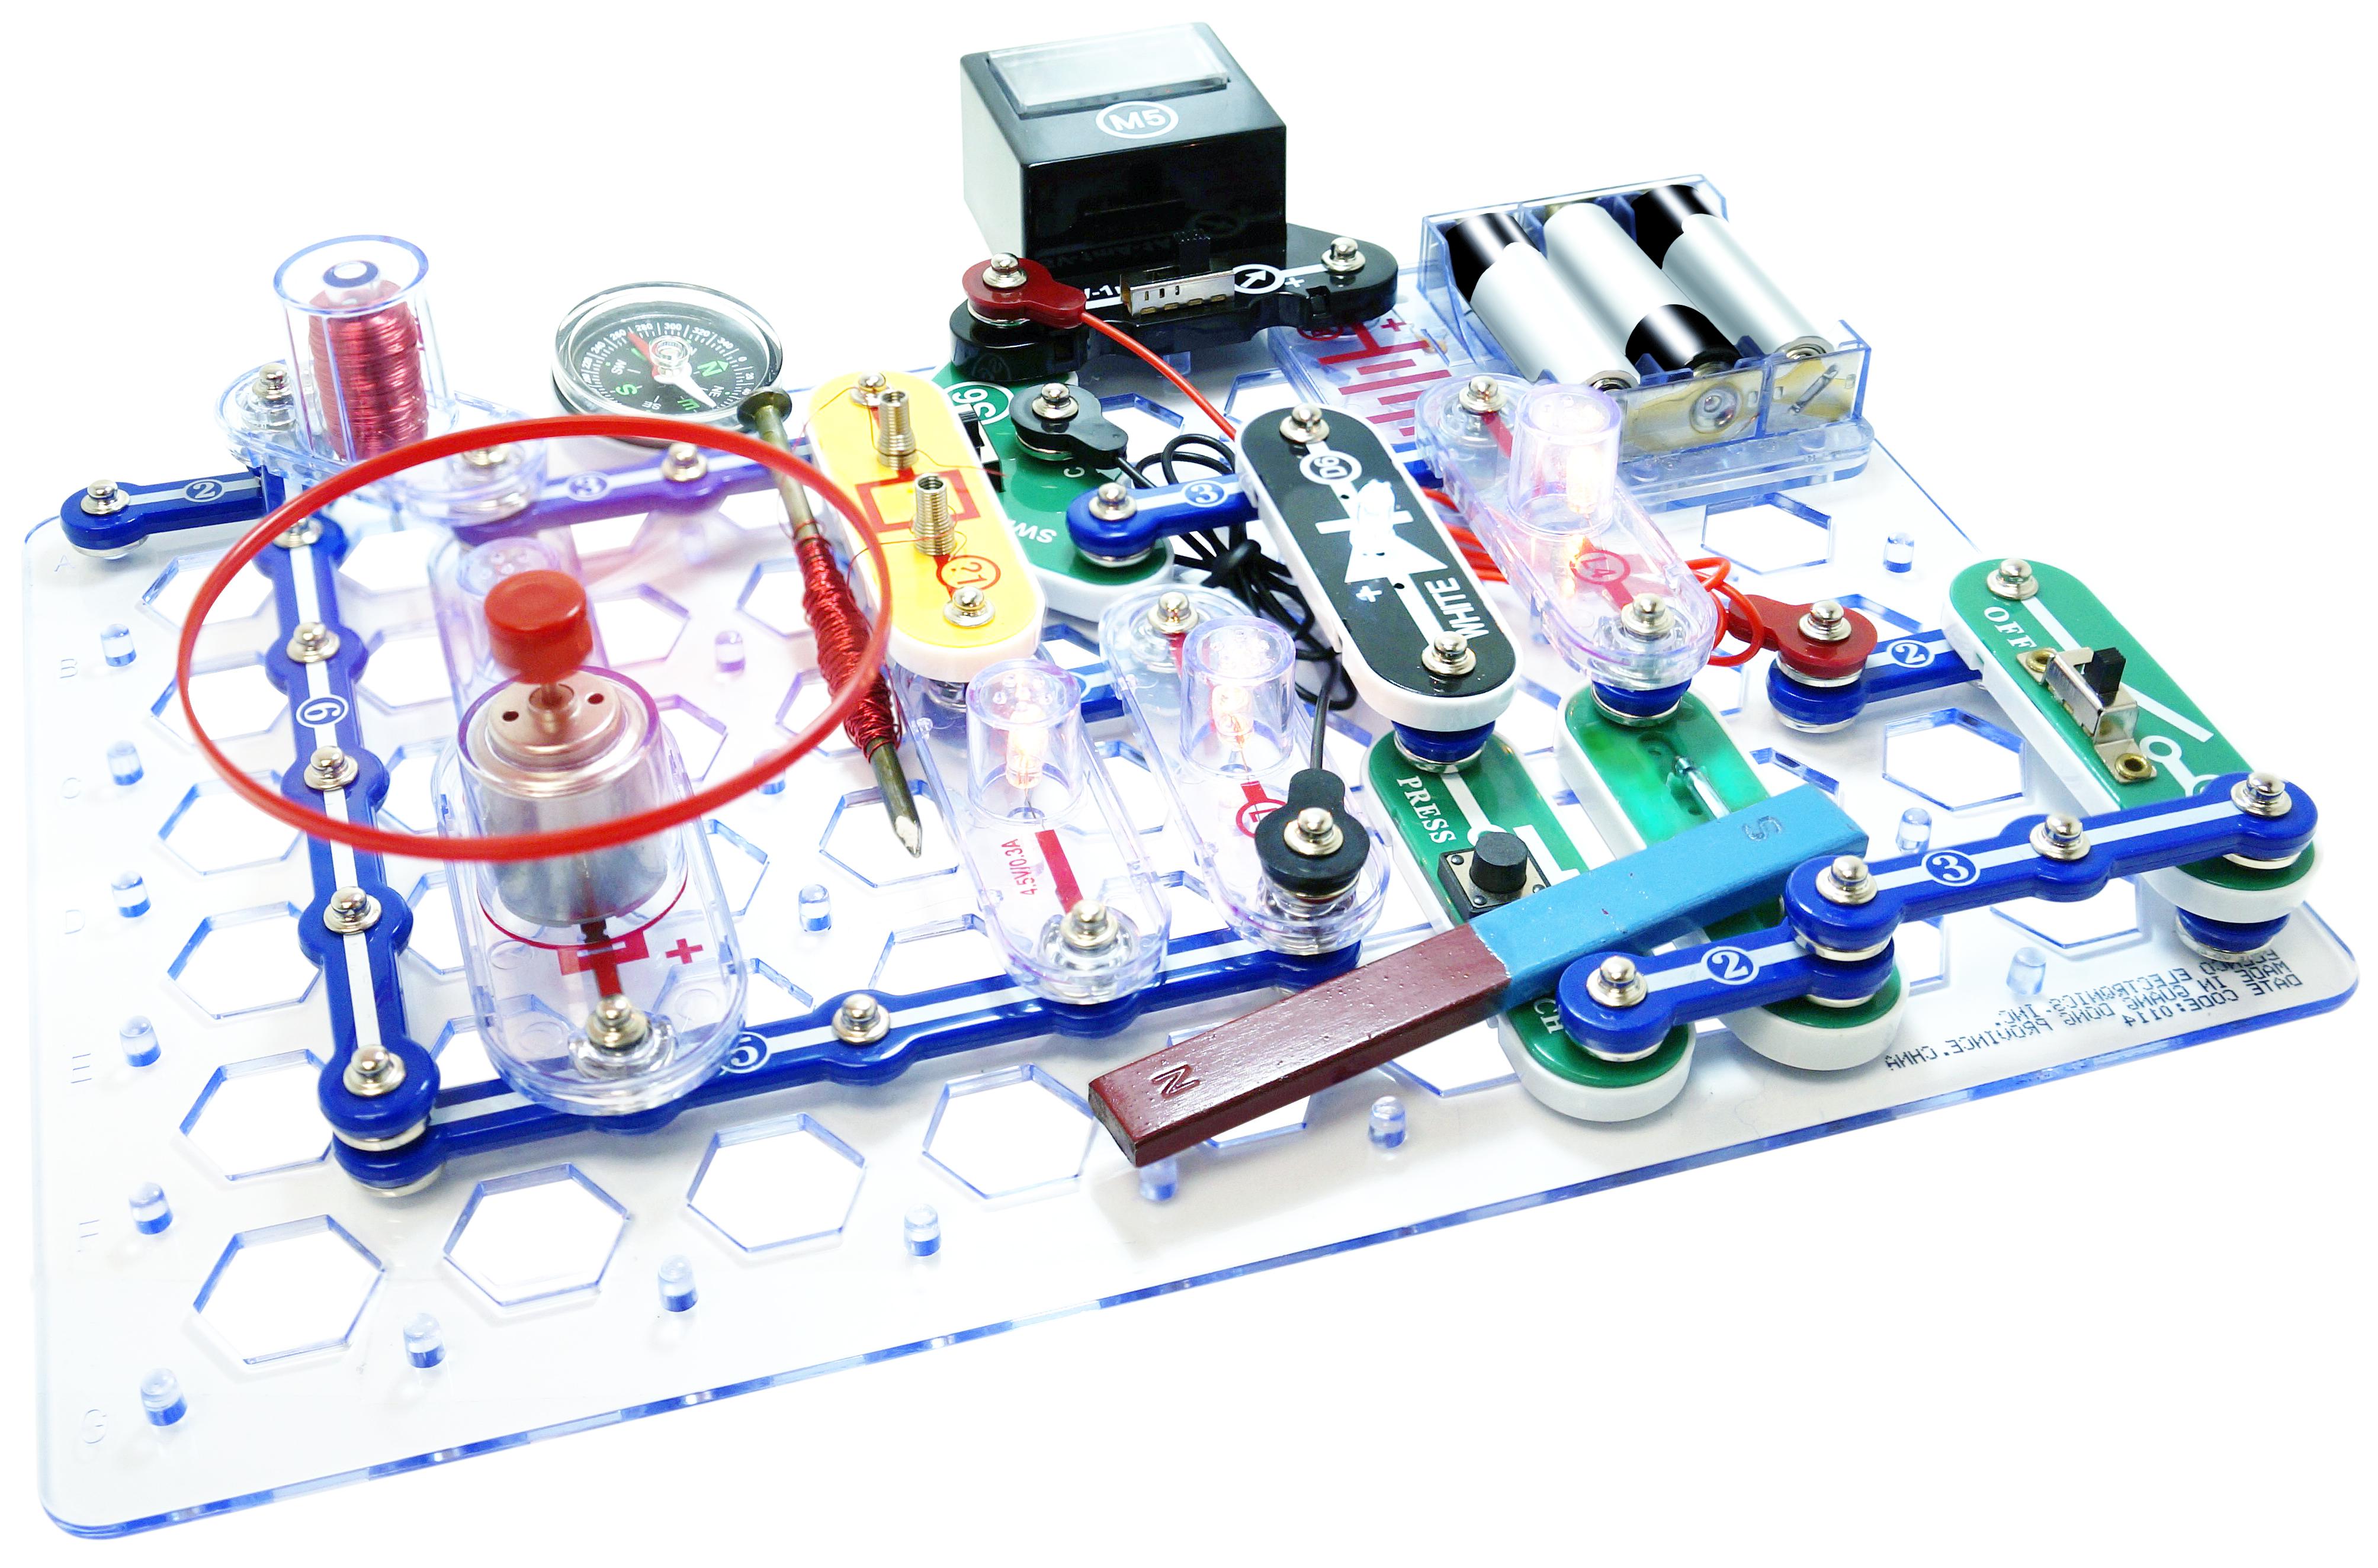 Elenco Snap Circuits Stem Electronics Discovery Kit 756619011905 Ebay Green Alternative Energy